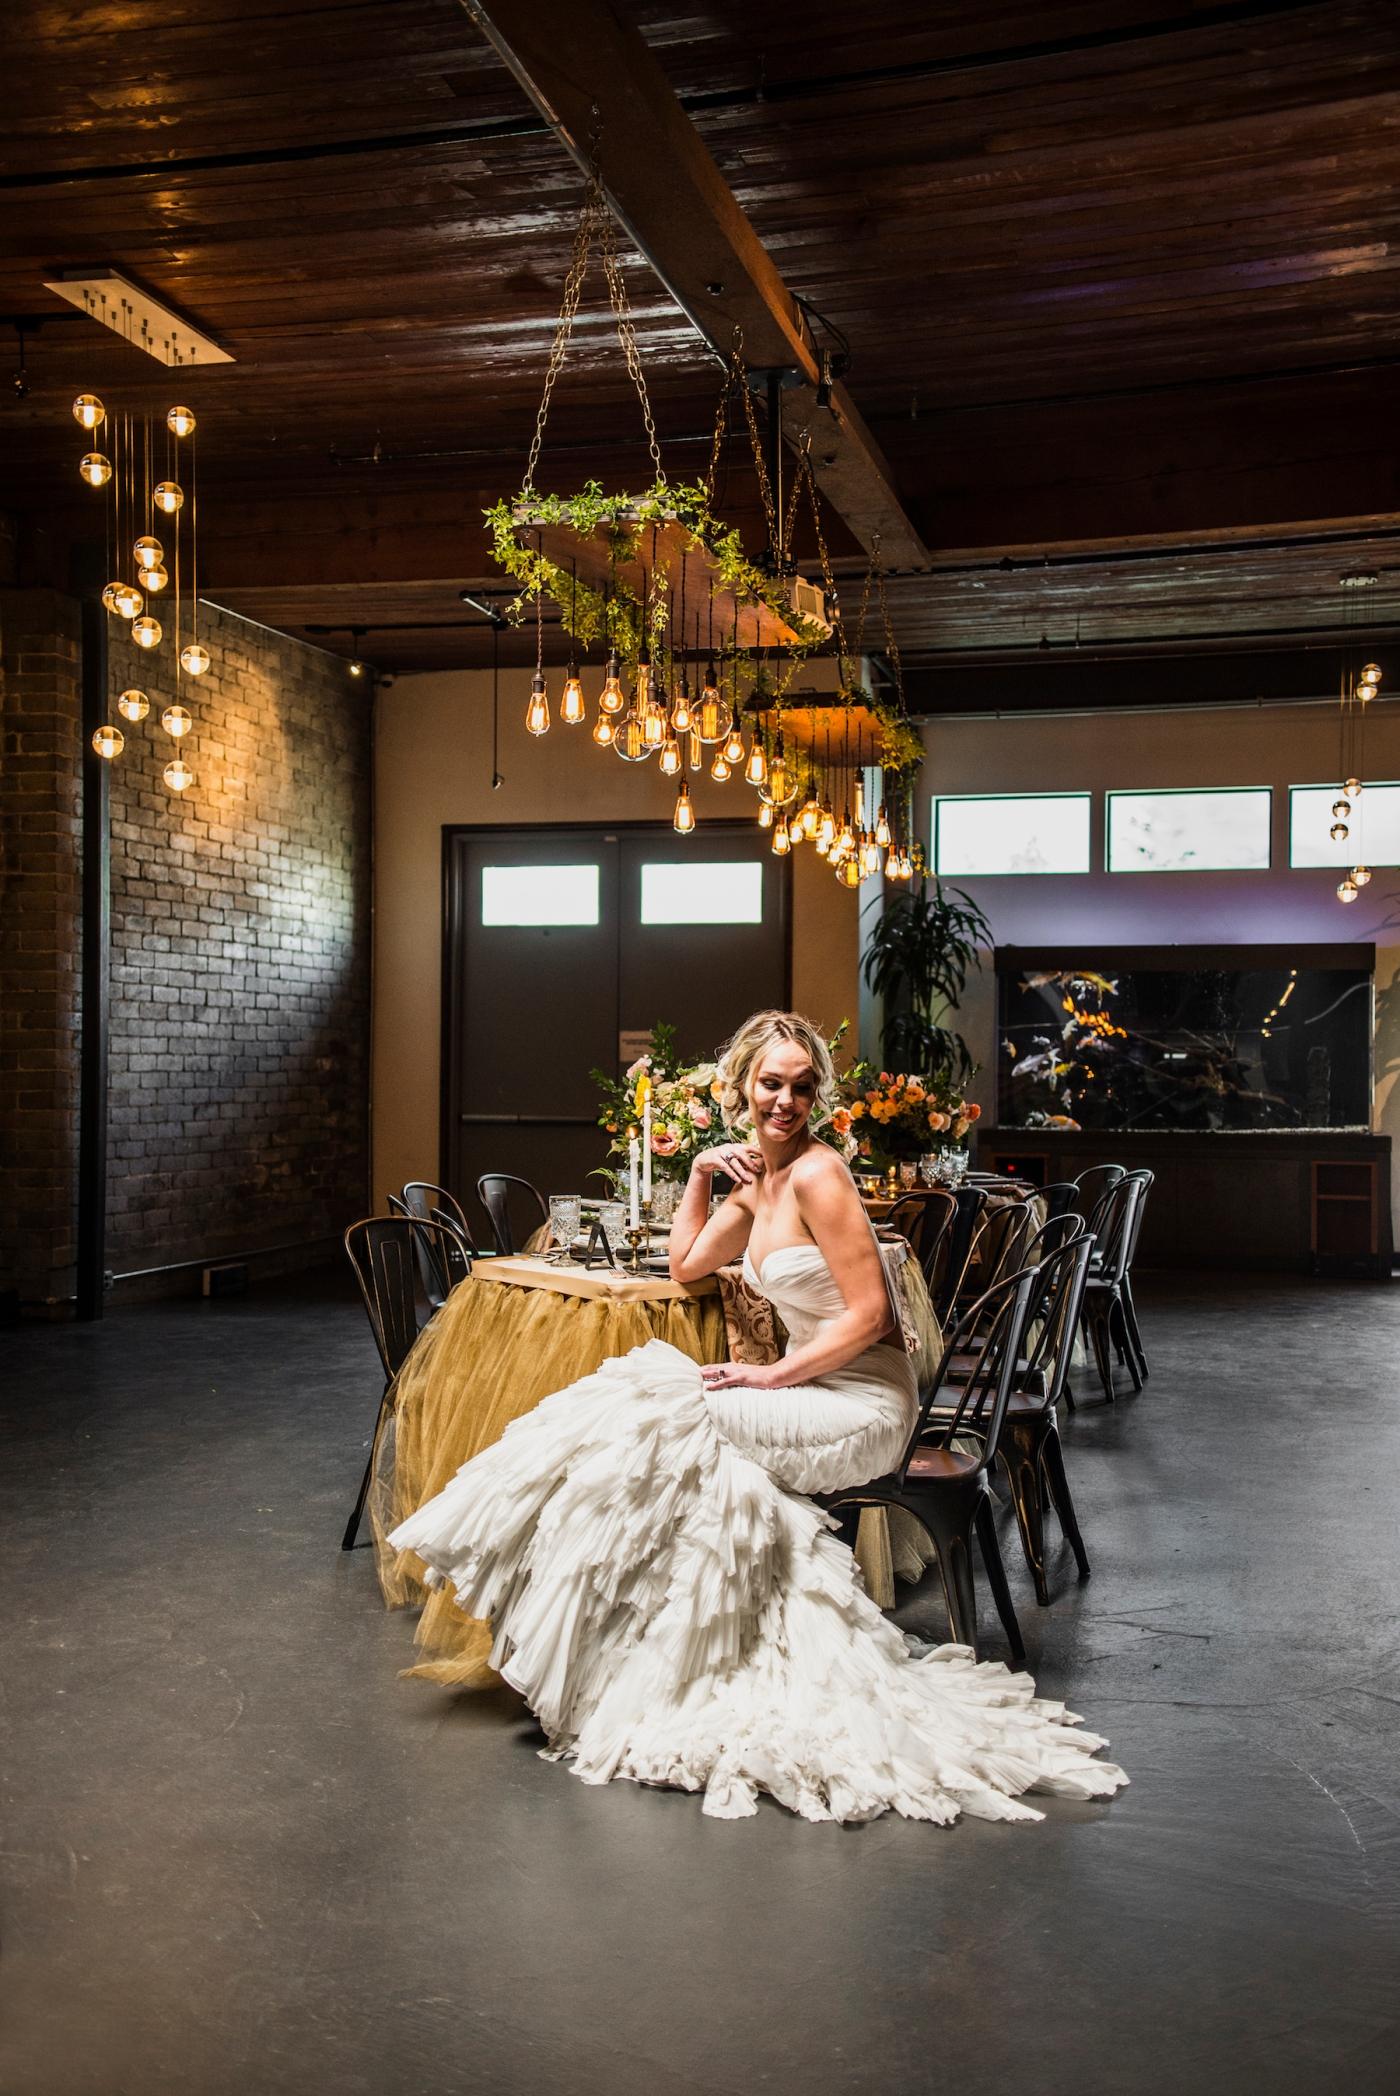 photography_by_jane_speleers_2017_wedding_show_i_do_sodo_within_designed_by_melody_davisdsc_0378